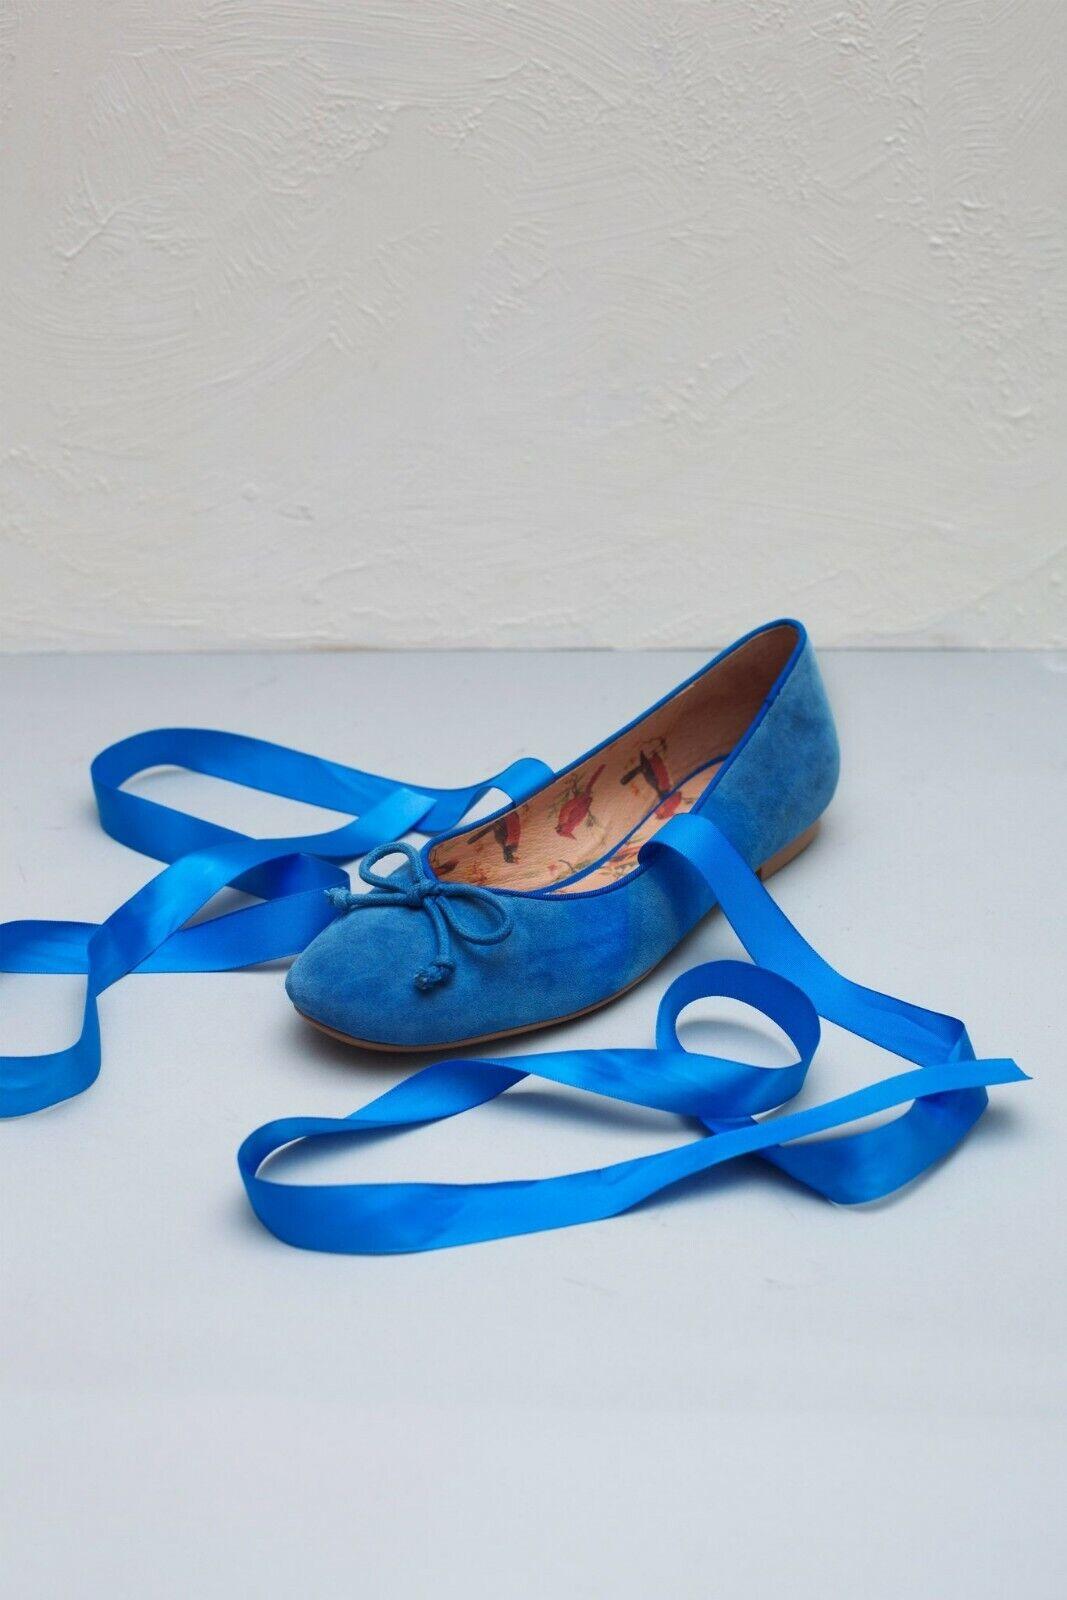 Miss L Fire MARGOT 40 blueE leather ballerina ballerina ballerina pumps Retro VTG style ff5605